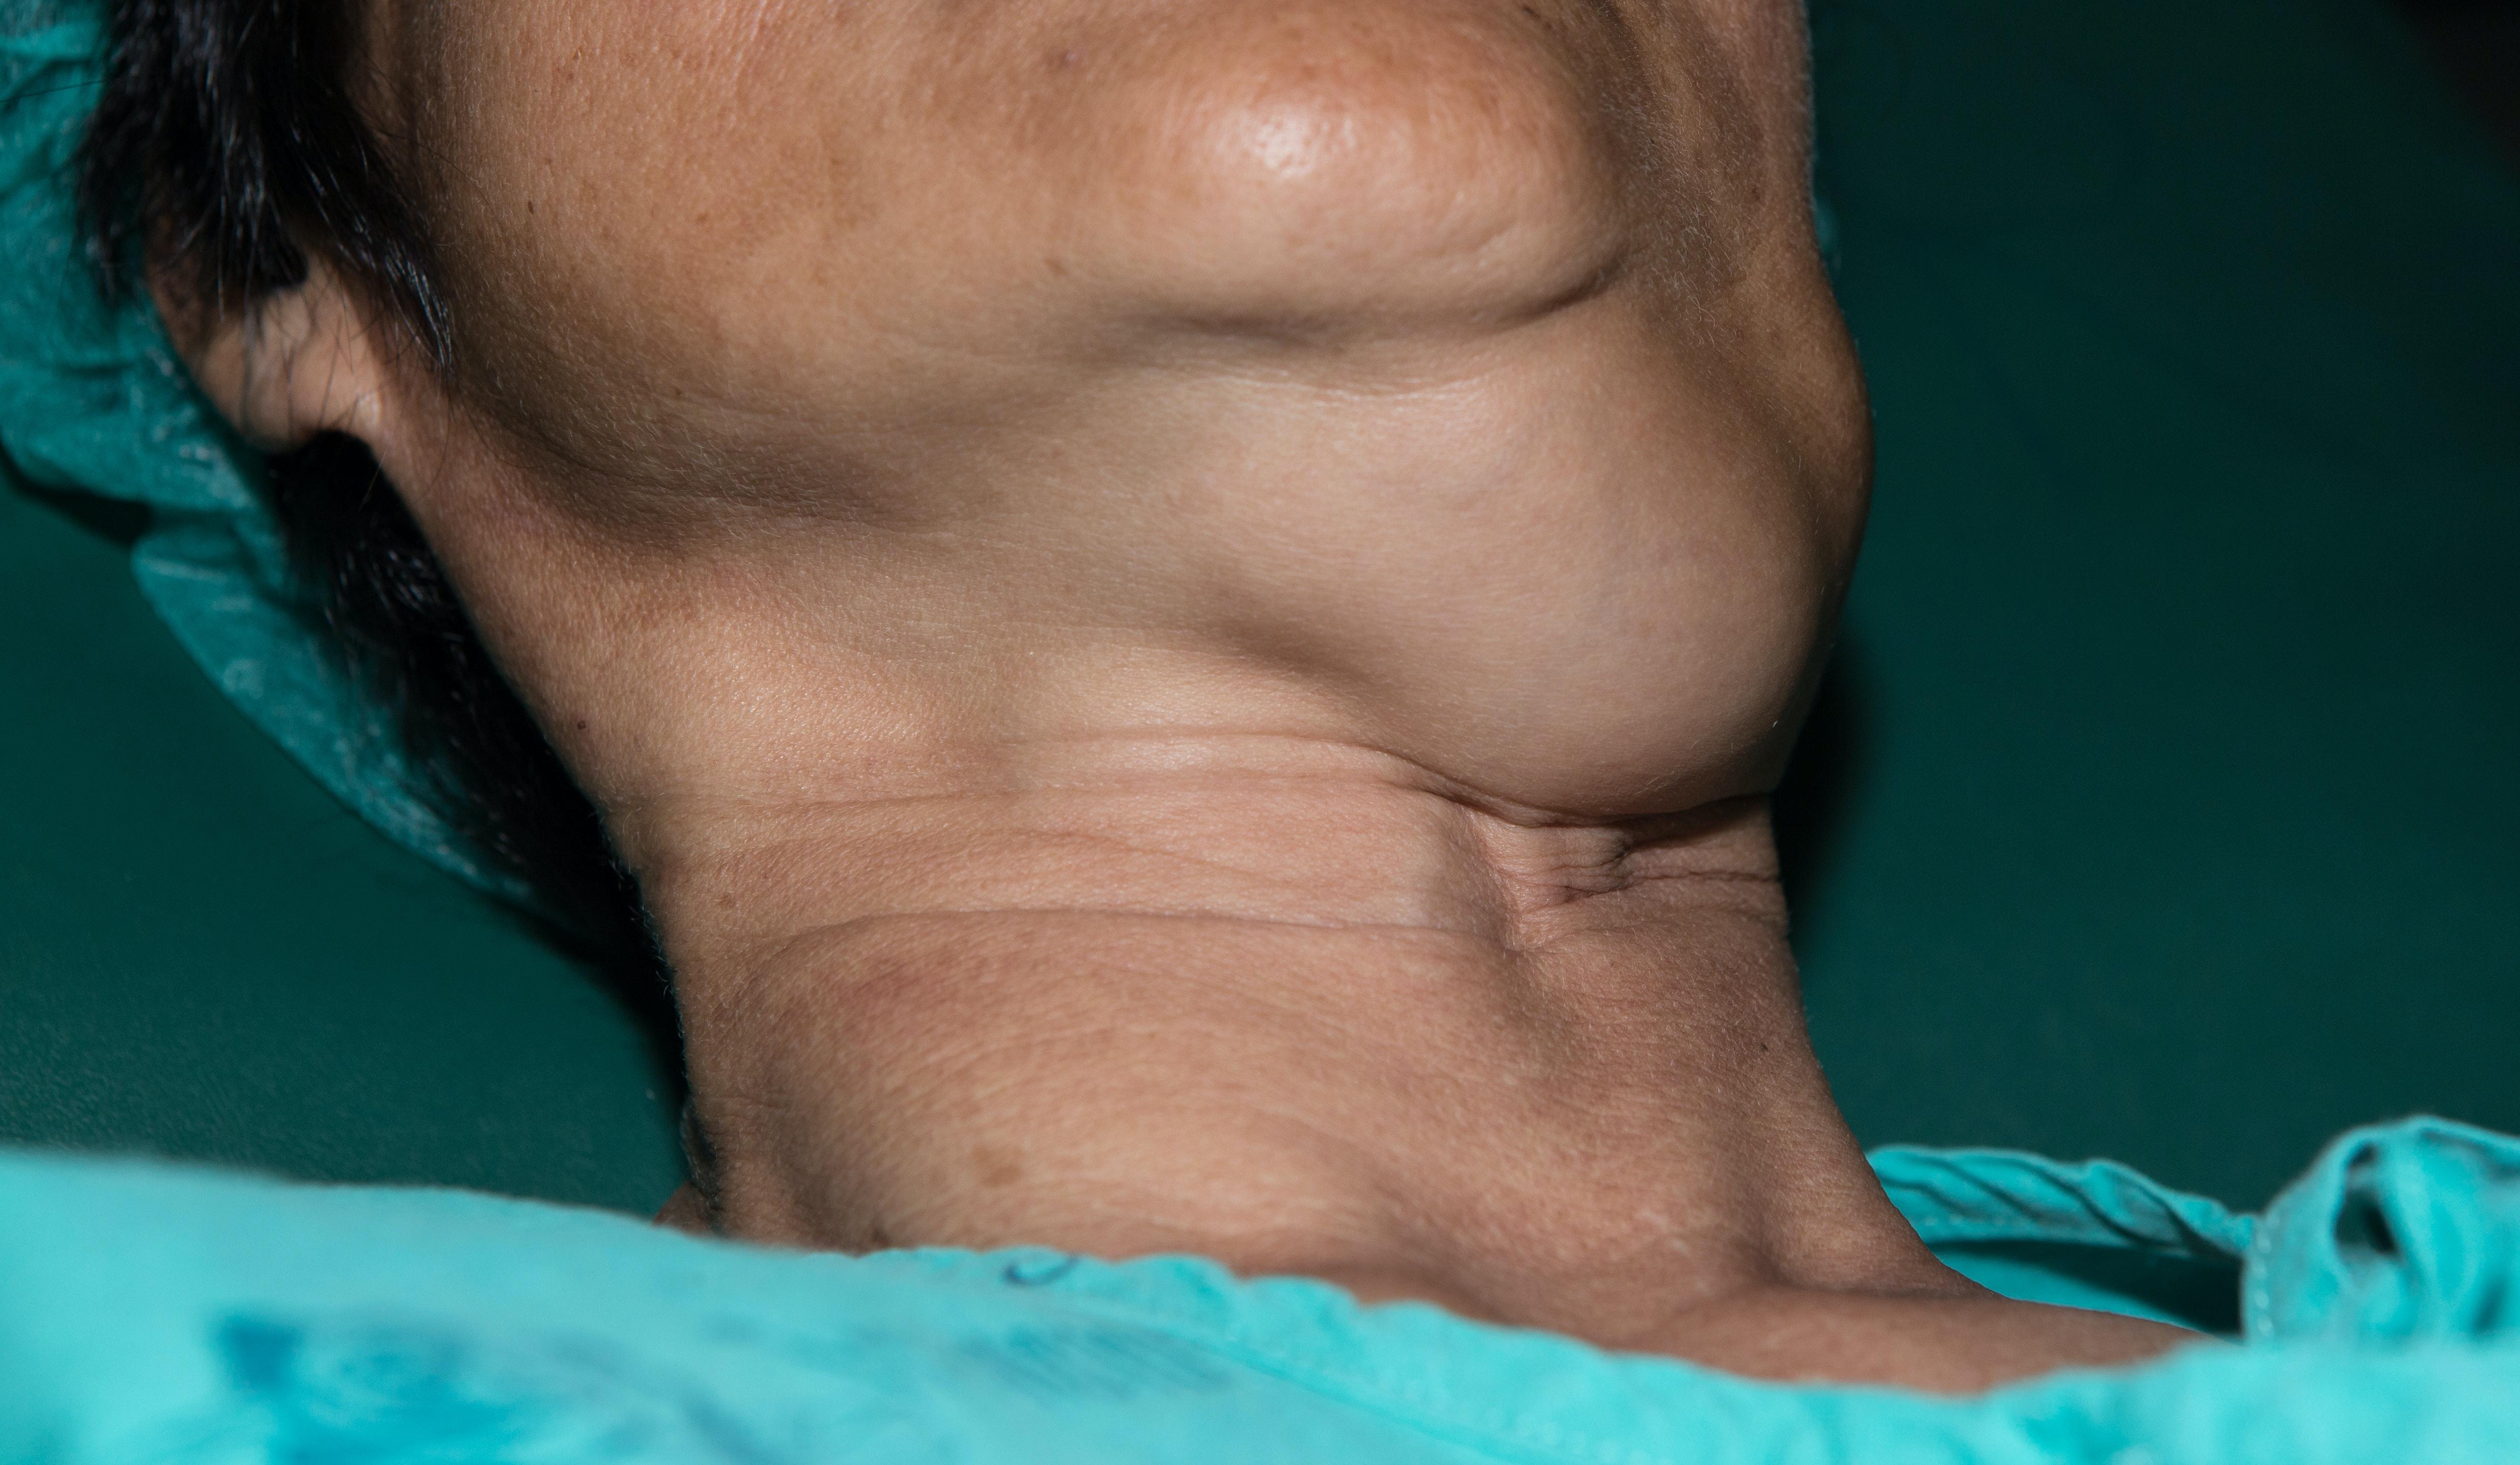 hpv neck lump